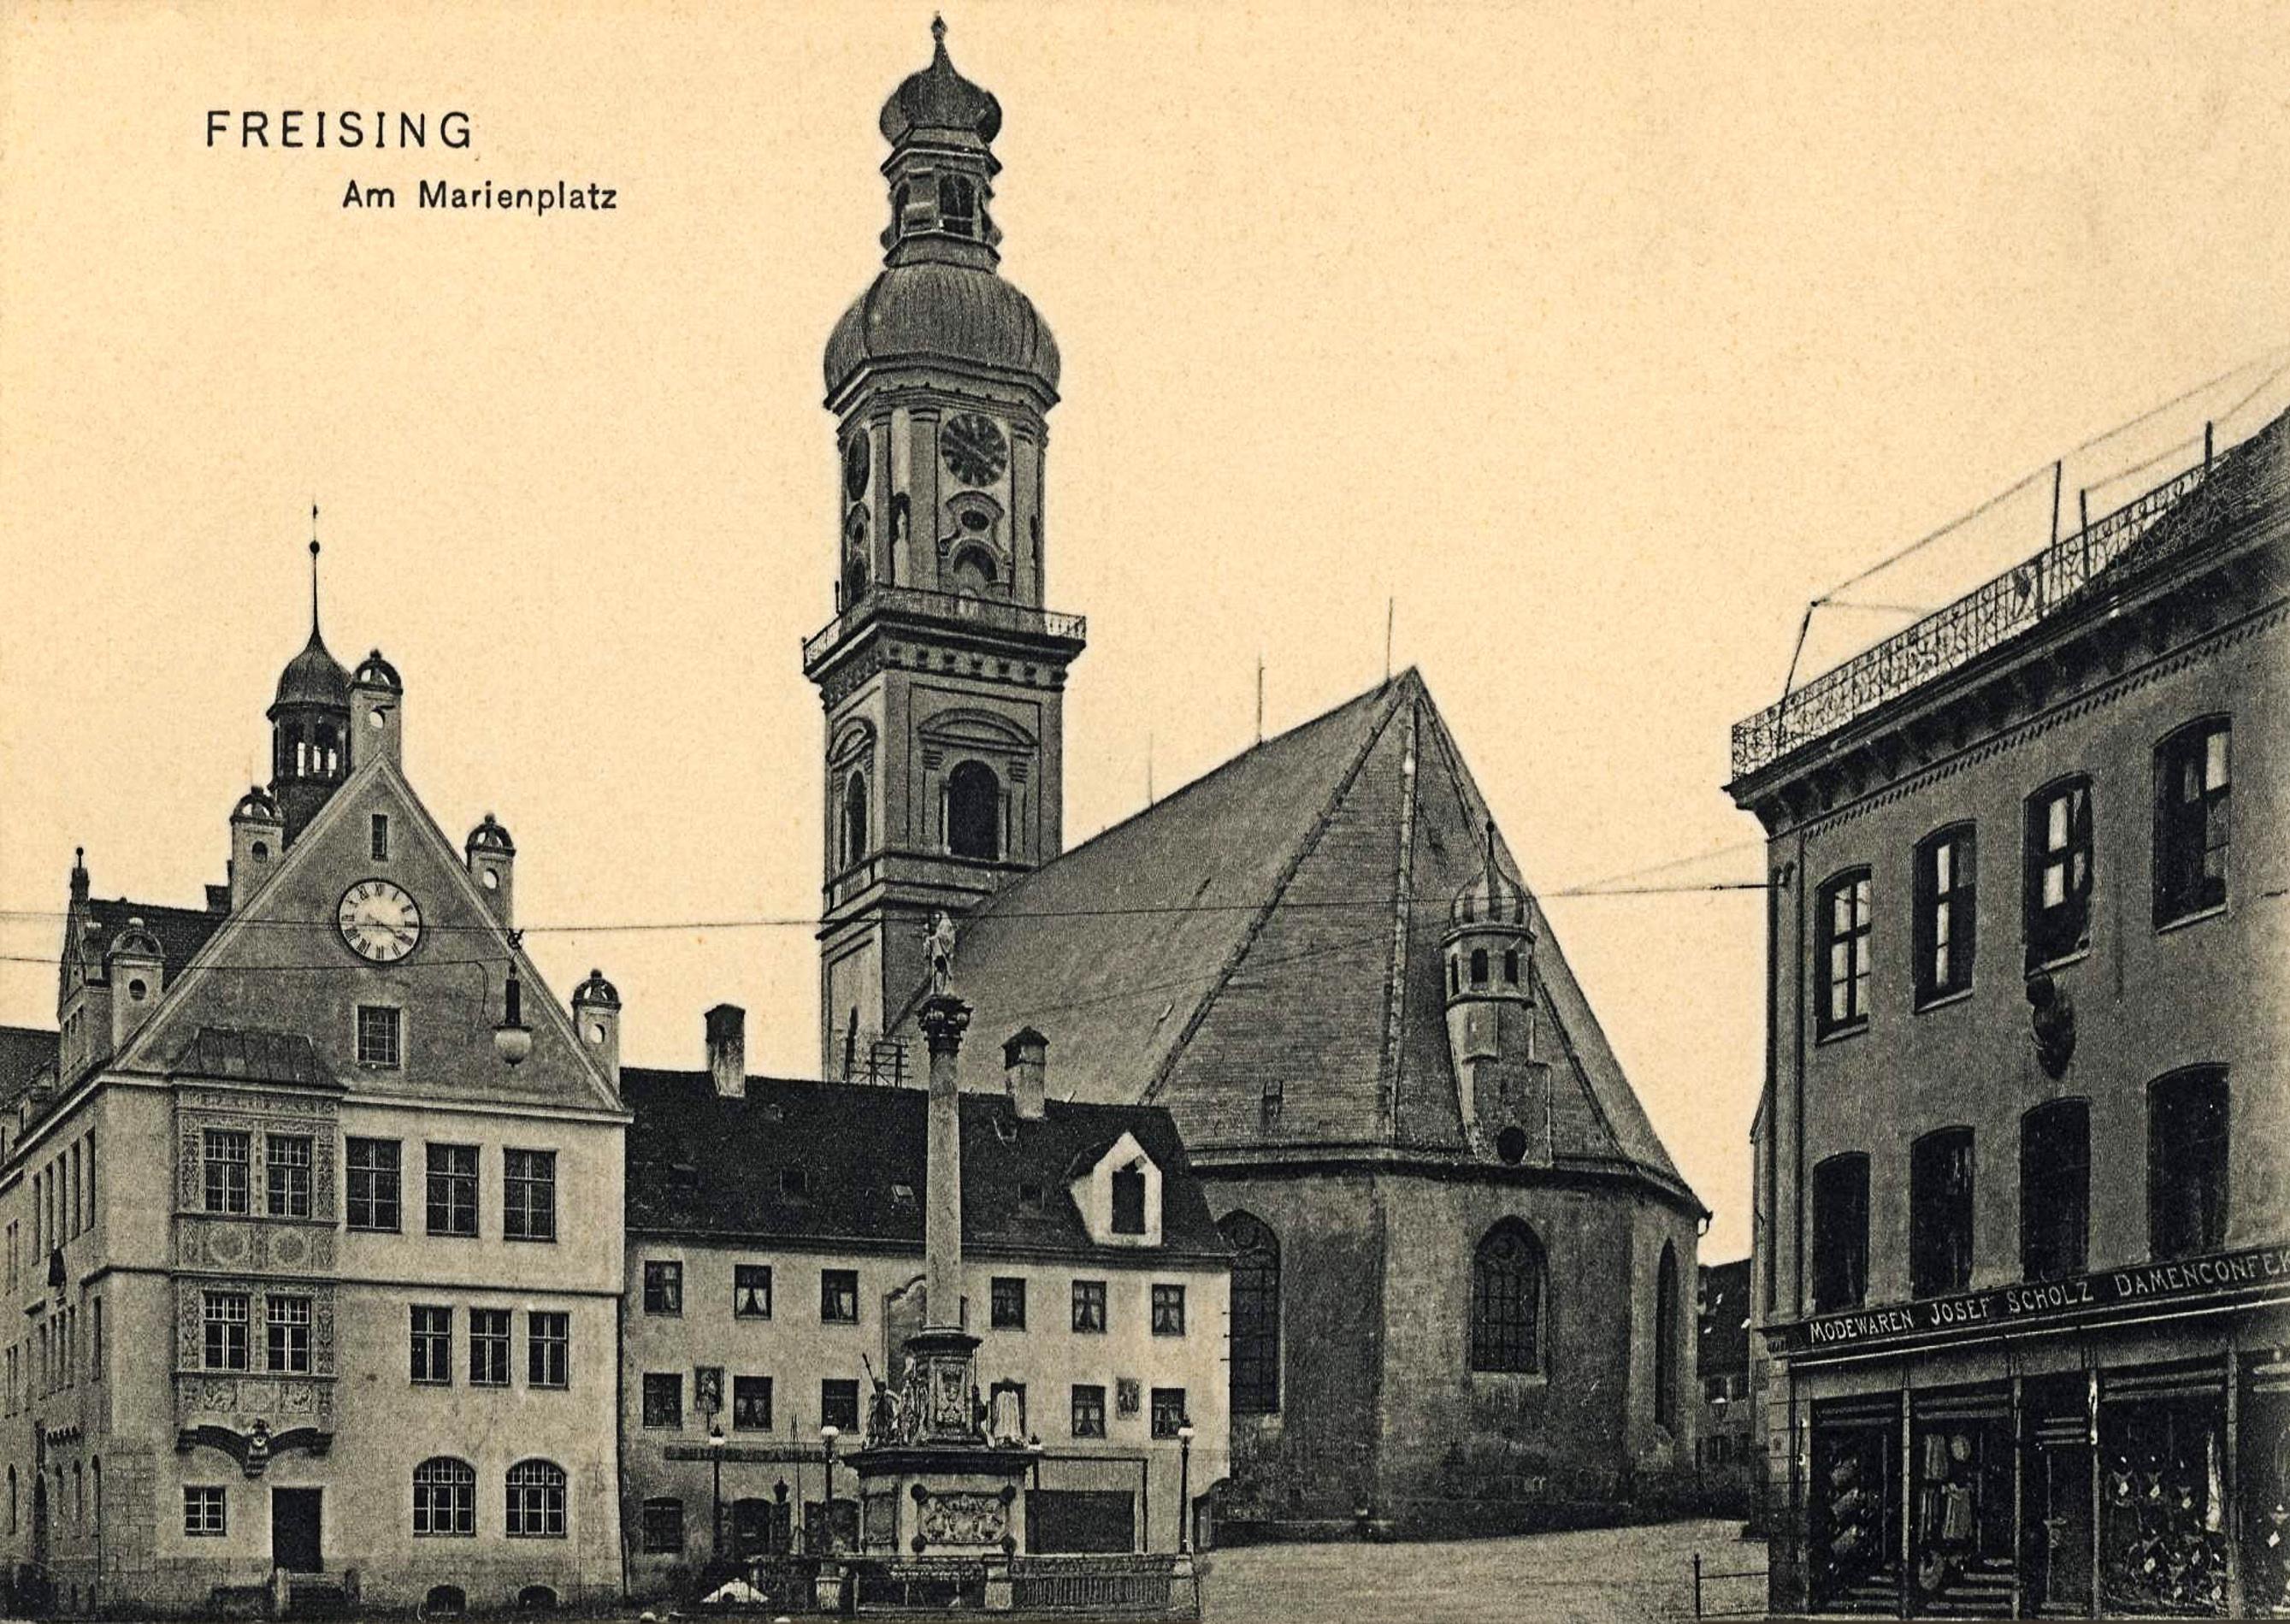 kosten c-dating Freising